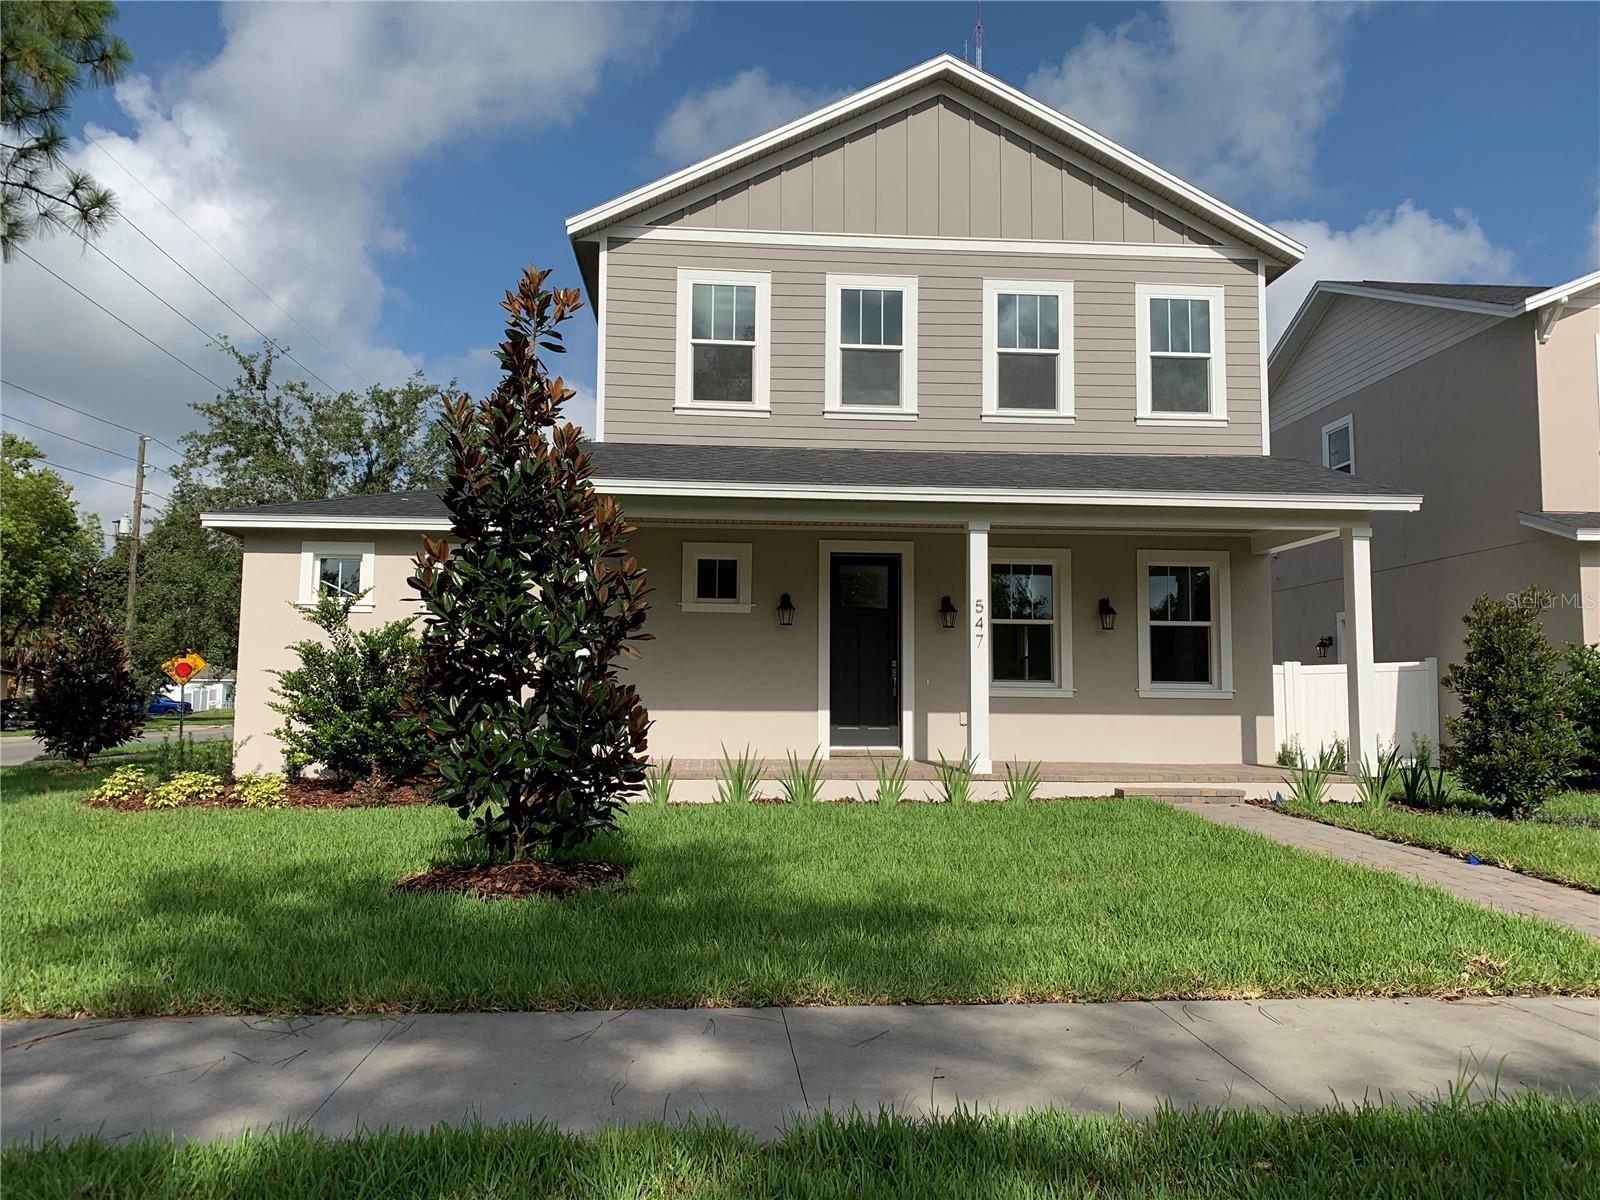 547 SEMINOLE STREET, Winter Garden, FL 34787 - #: O5919994